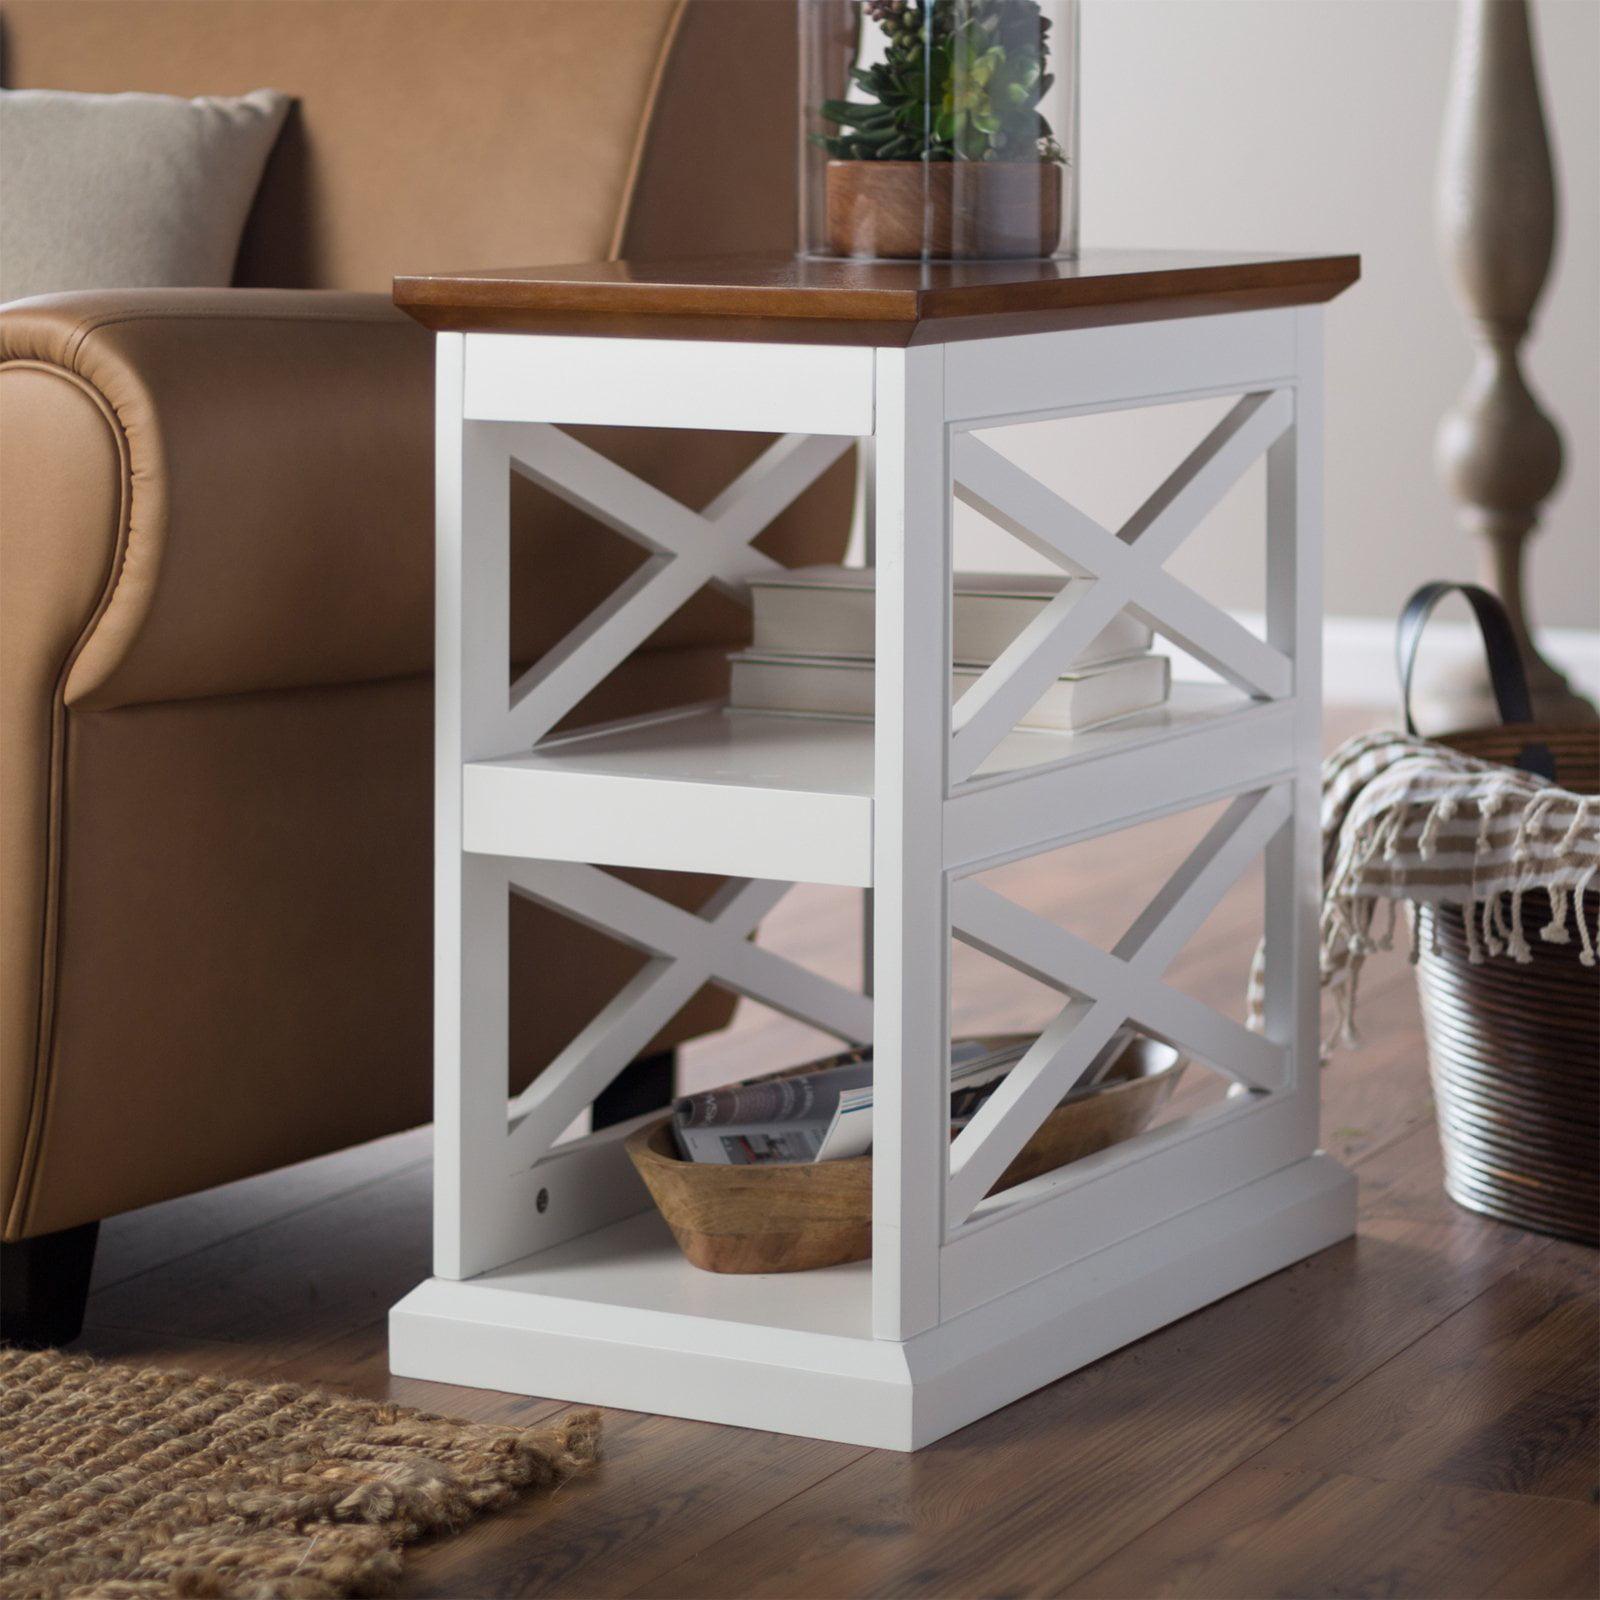 Belham Living Hampton Chair Side Table - White/Oak - Walmart.com